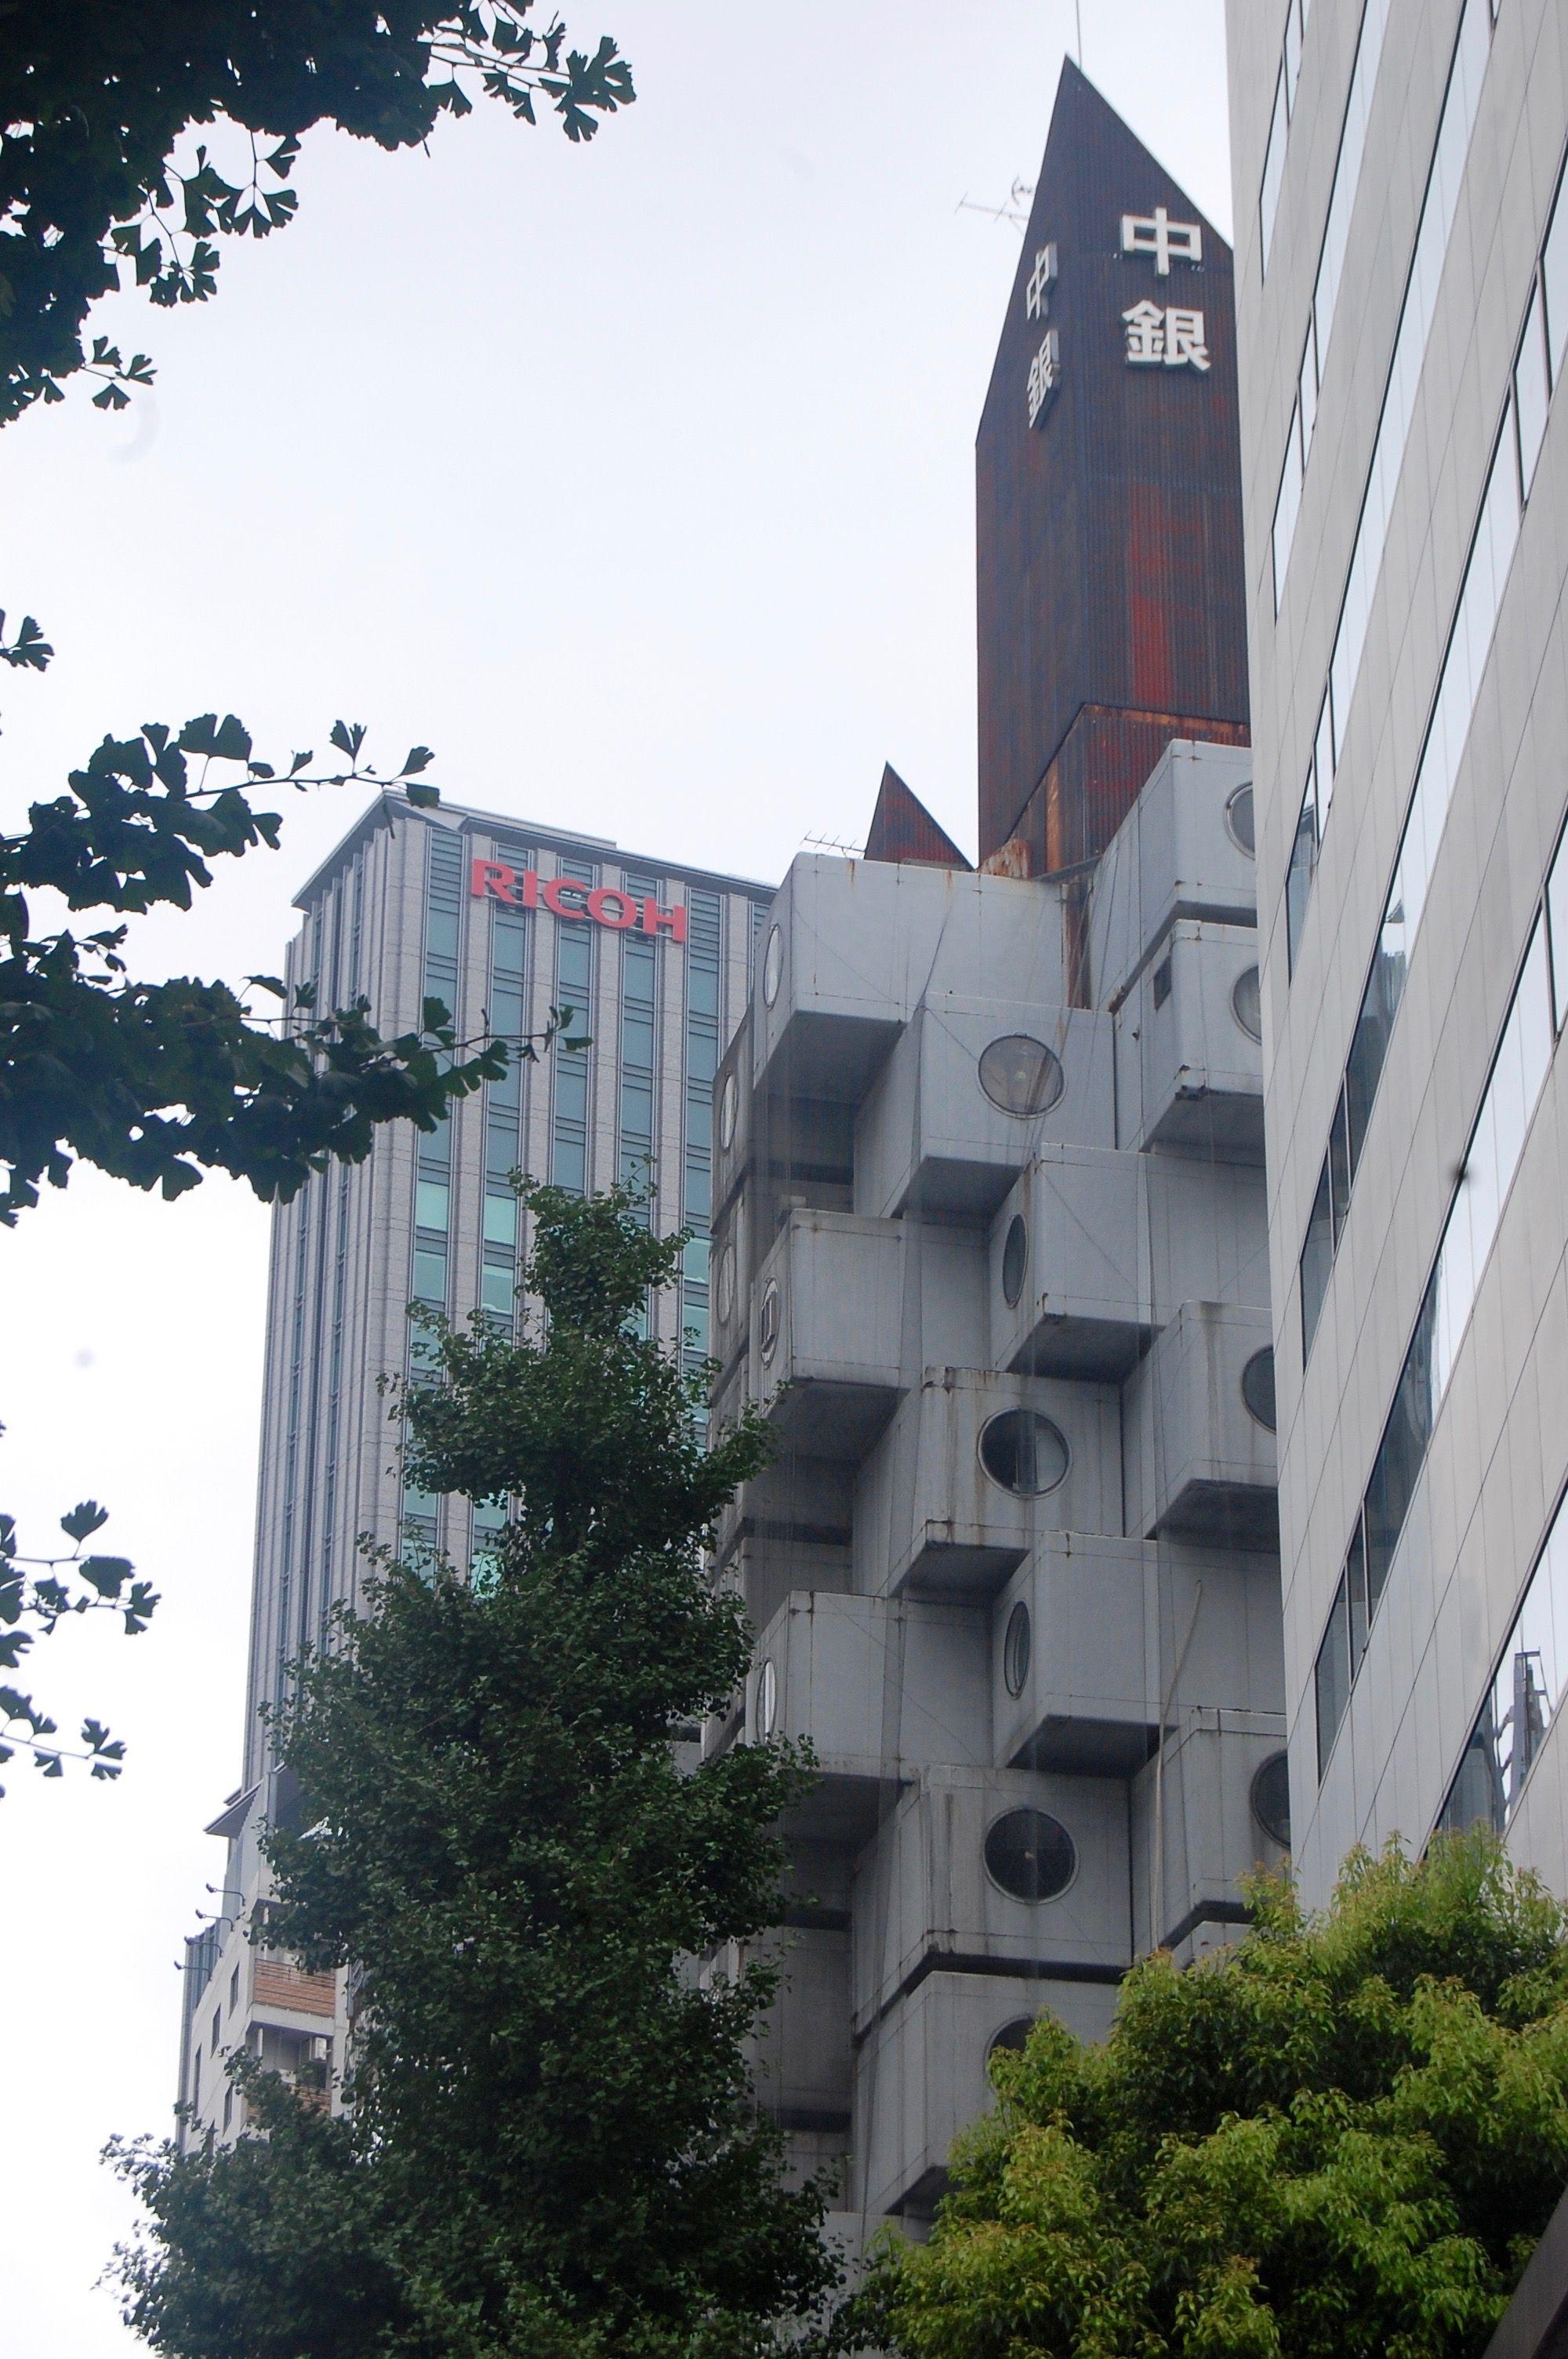 Nakagin Capsule Tower VIAGGIO A TOKYO